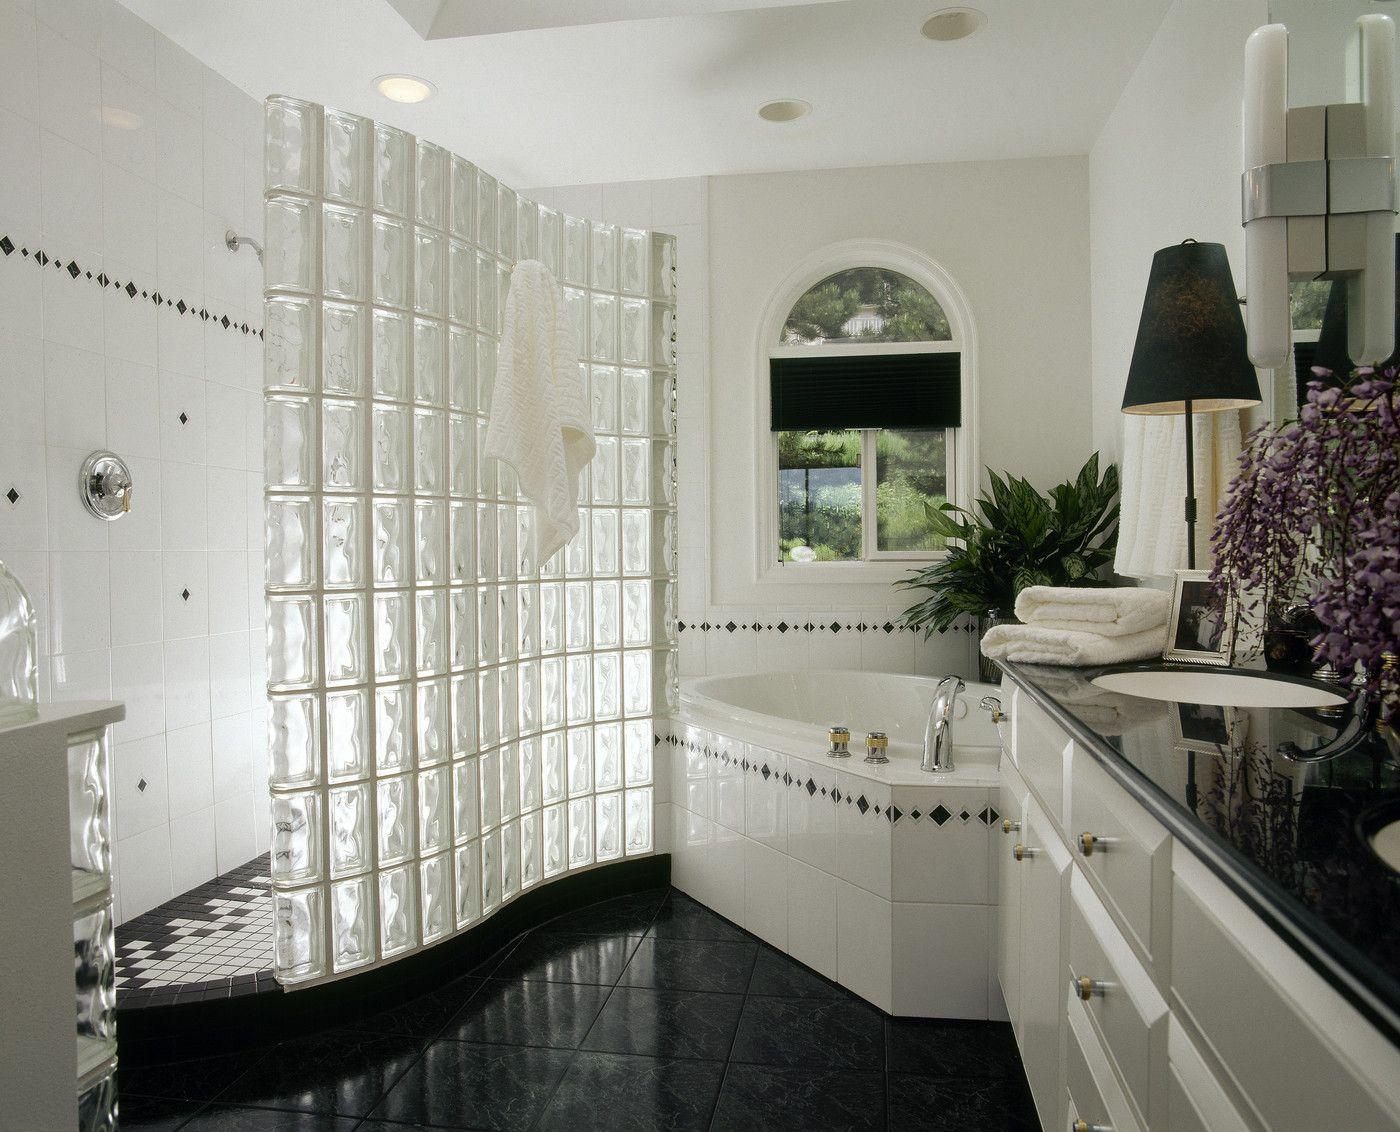 Bathroom interior hd decorative tile low near tub  bathroom remodel ideas  pinterest